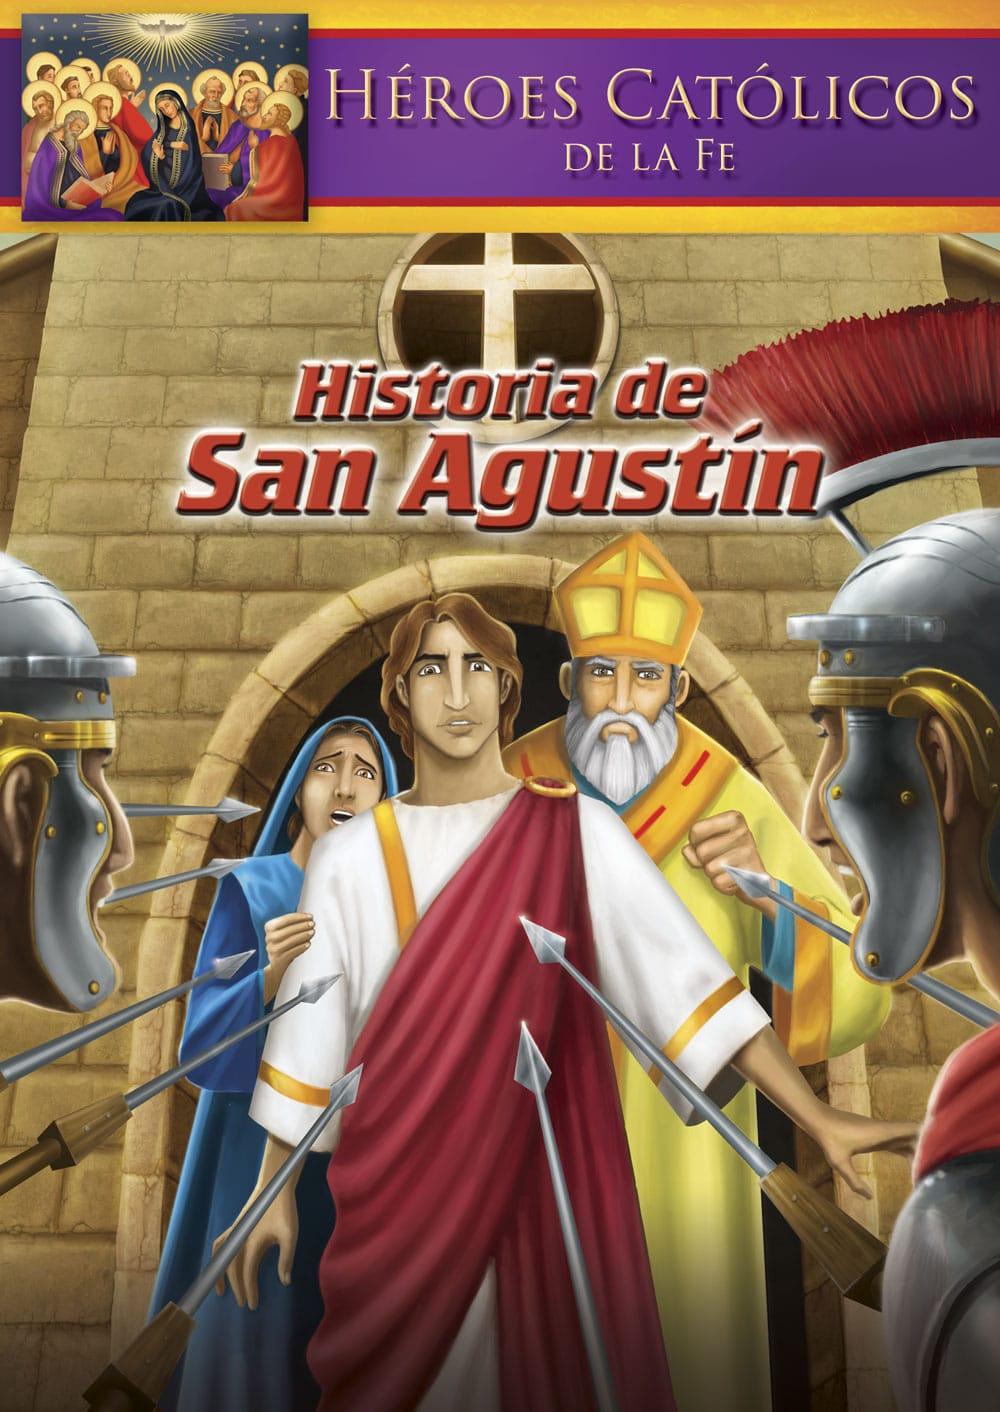 Historia de San Agustín (Héroes católicos de la fe)